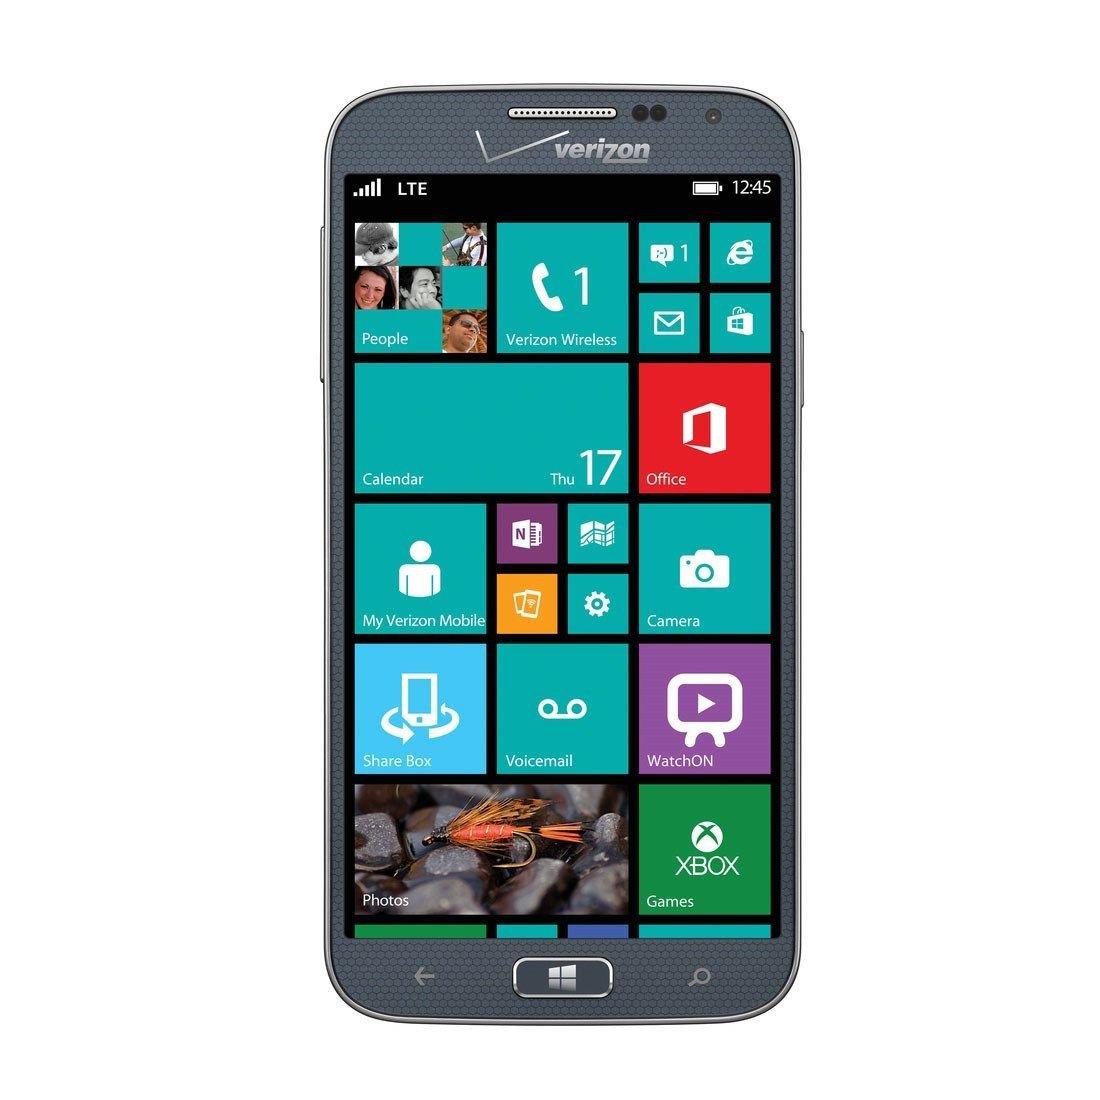 Samsung w750 ativ se 16gb verizon wireless 4g lte windows for Window 4g mobile